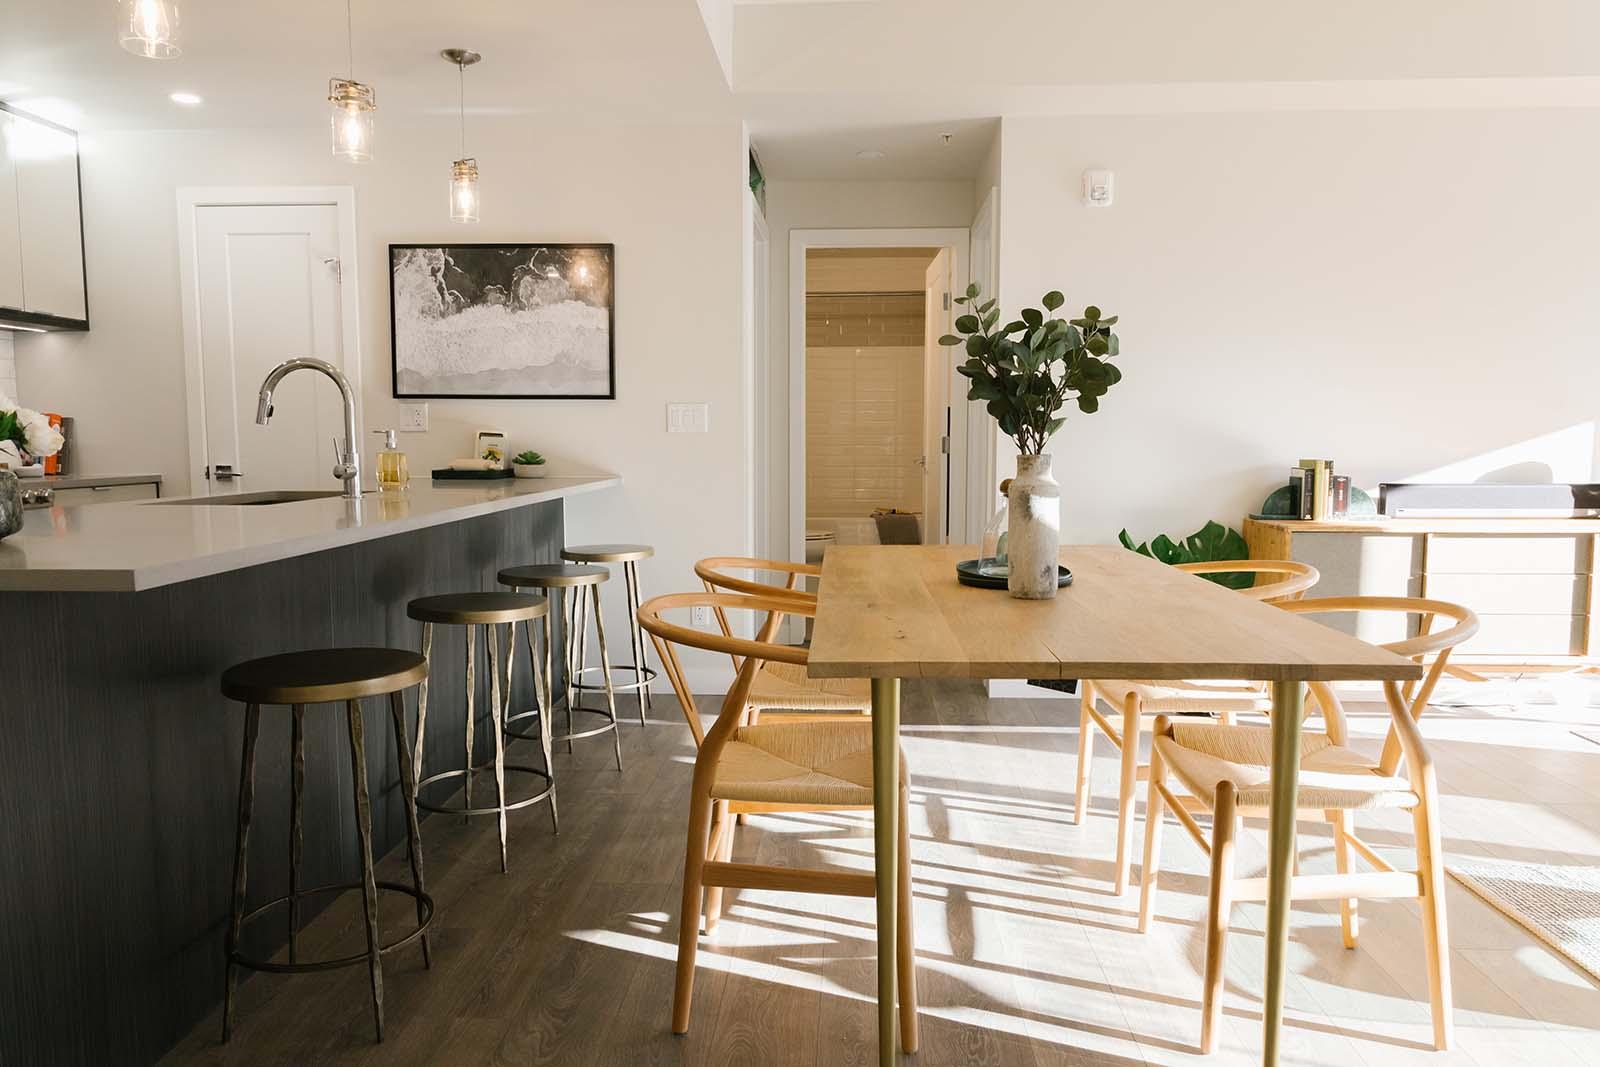 Coco Suites by Sarina Homes | Real Estate Development Interior Design